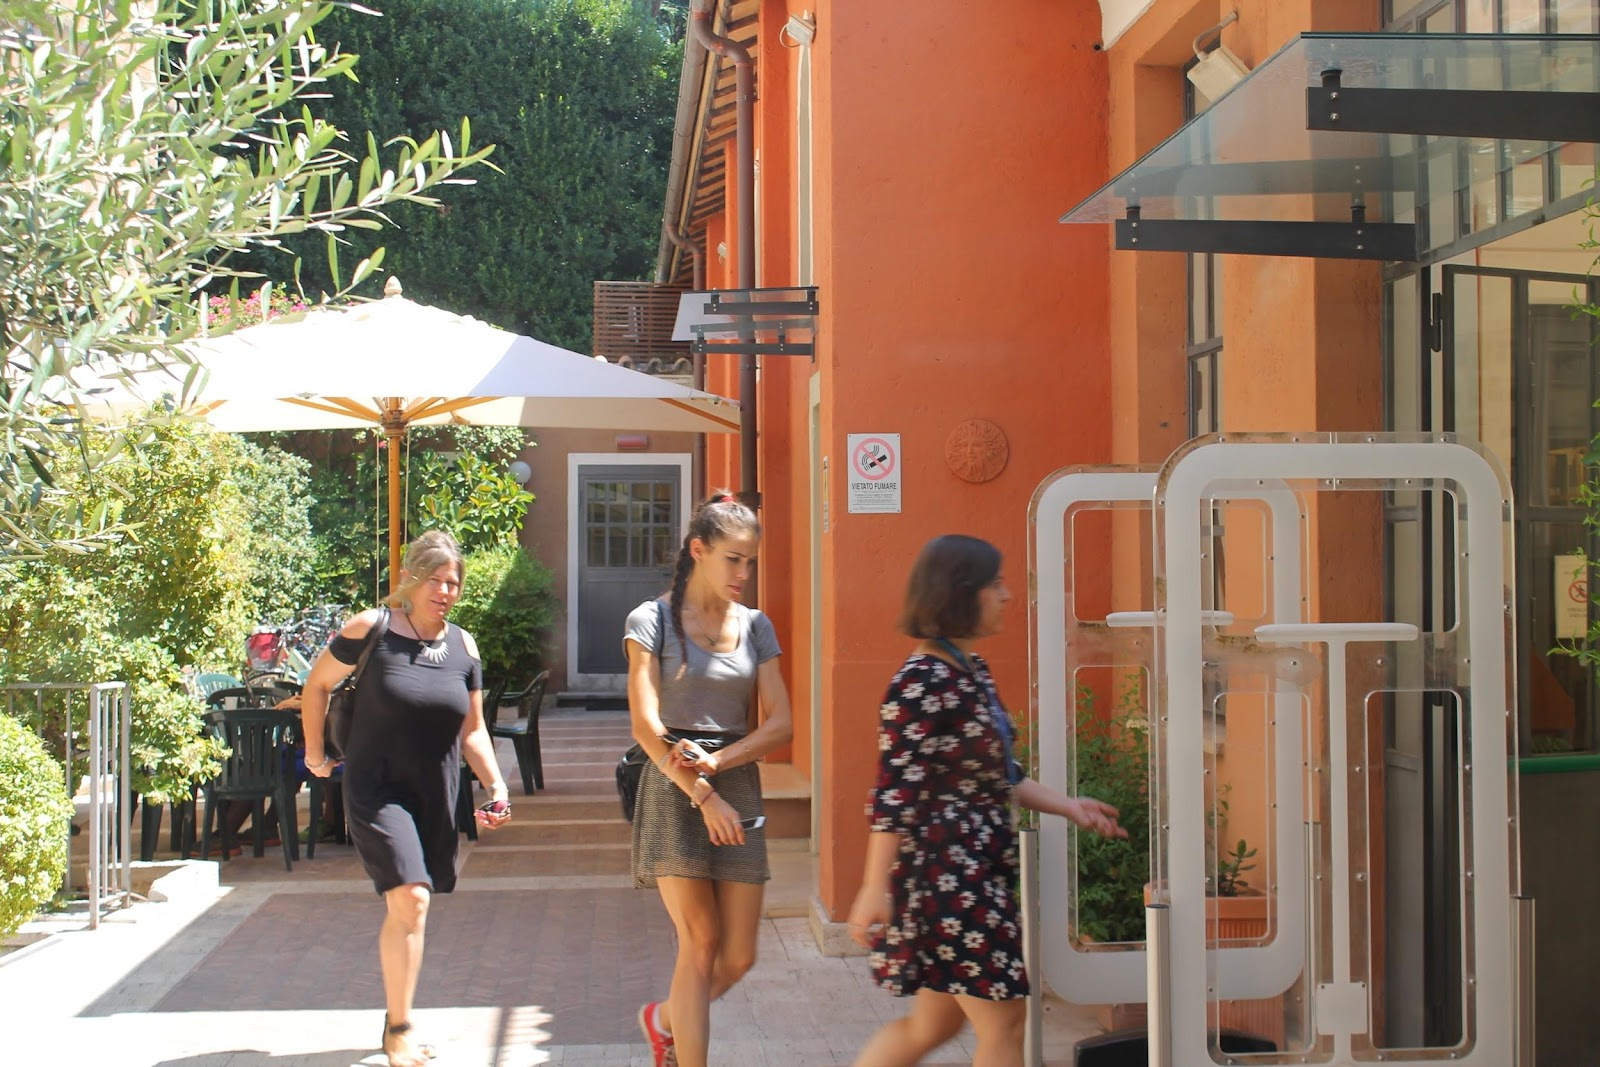 Students walking through JCU's Guarini campus